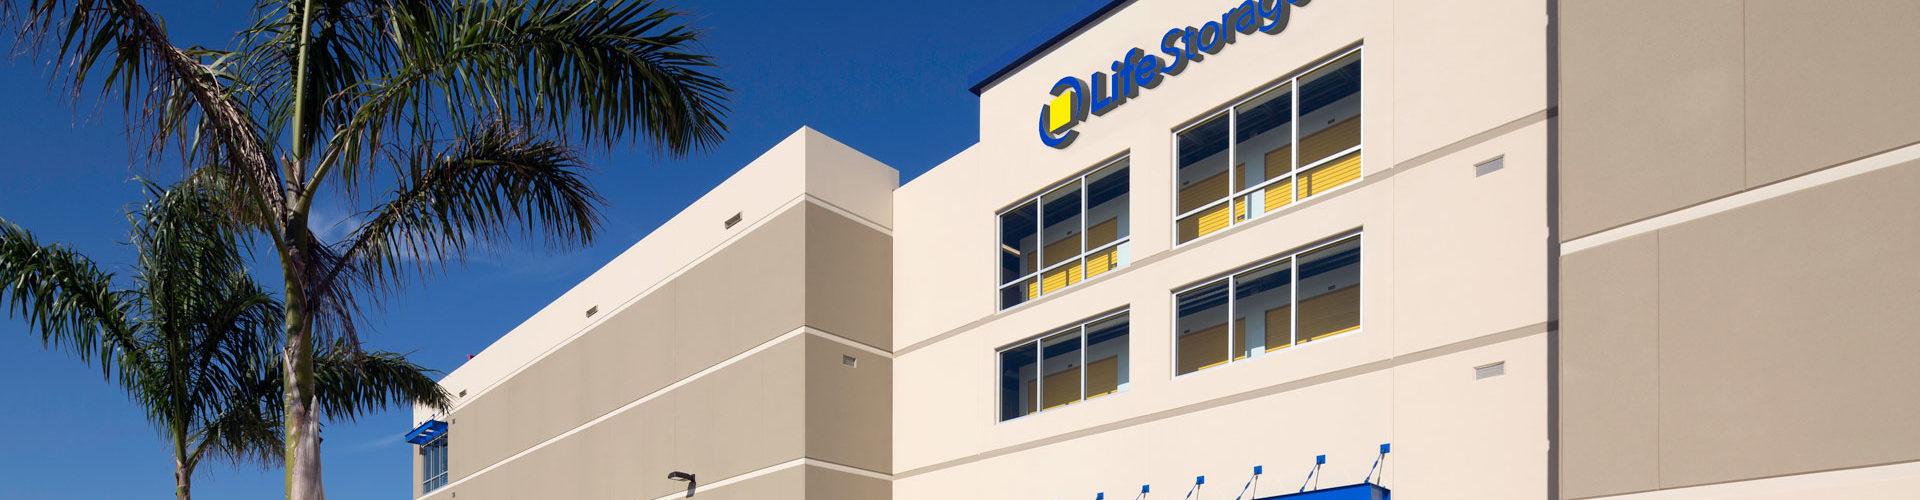 Questions about Storage Unit Rentals